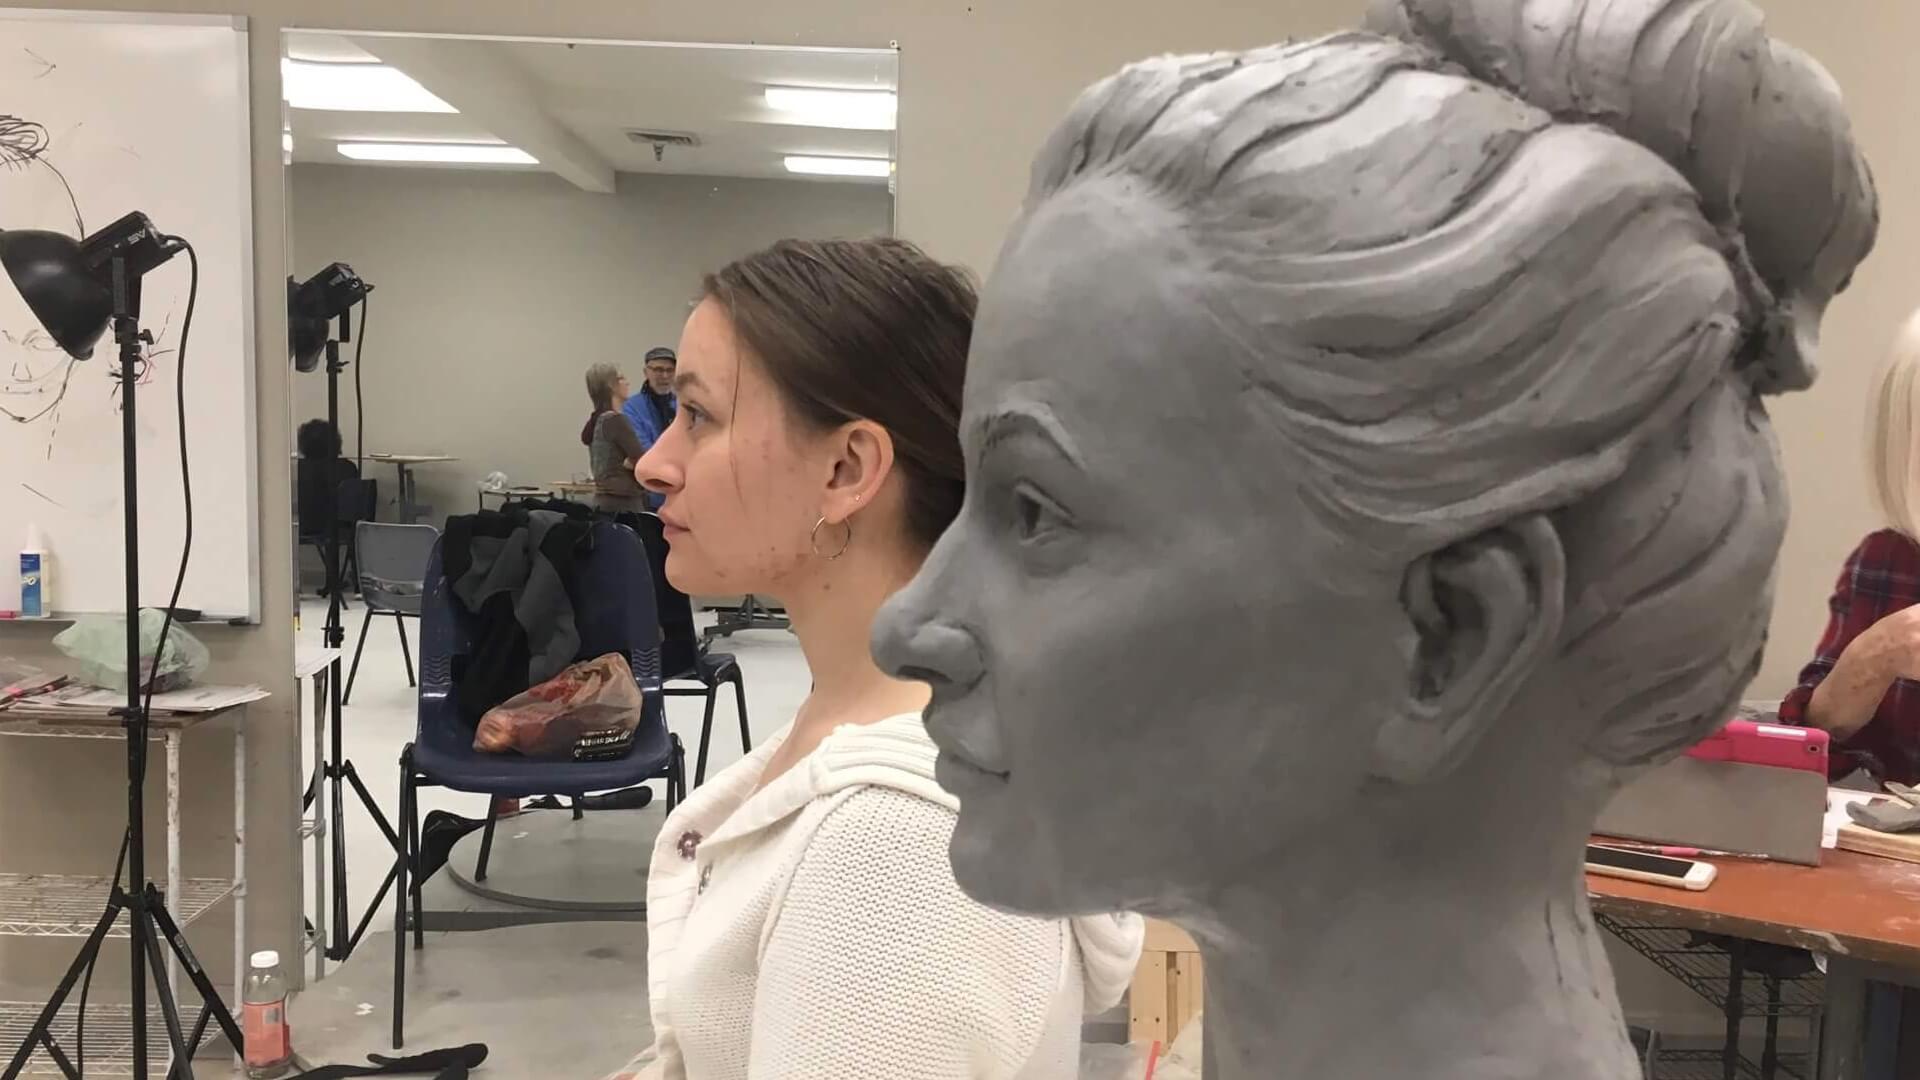 Work in progress - clay bust sculpture by artist Stephanie Hunter